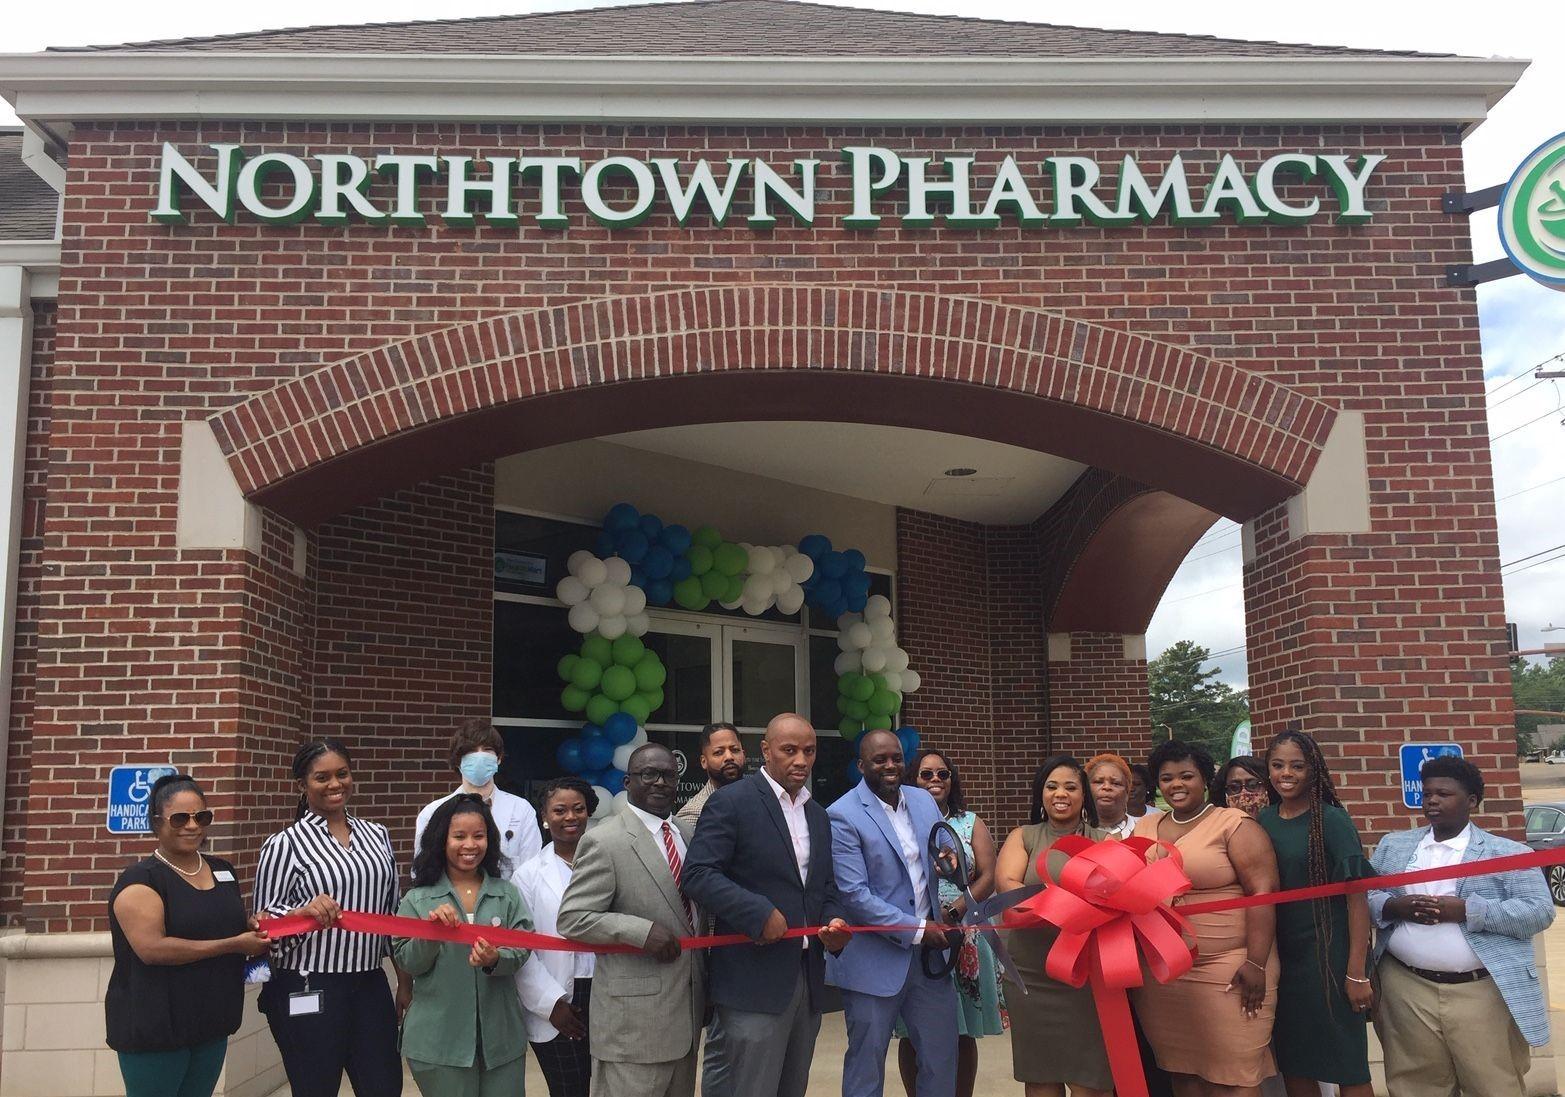 Northtown-Pharmacy-(2).jpg